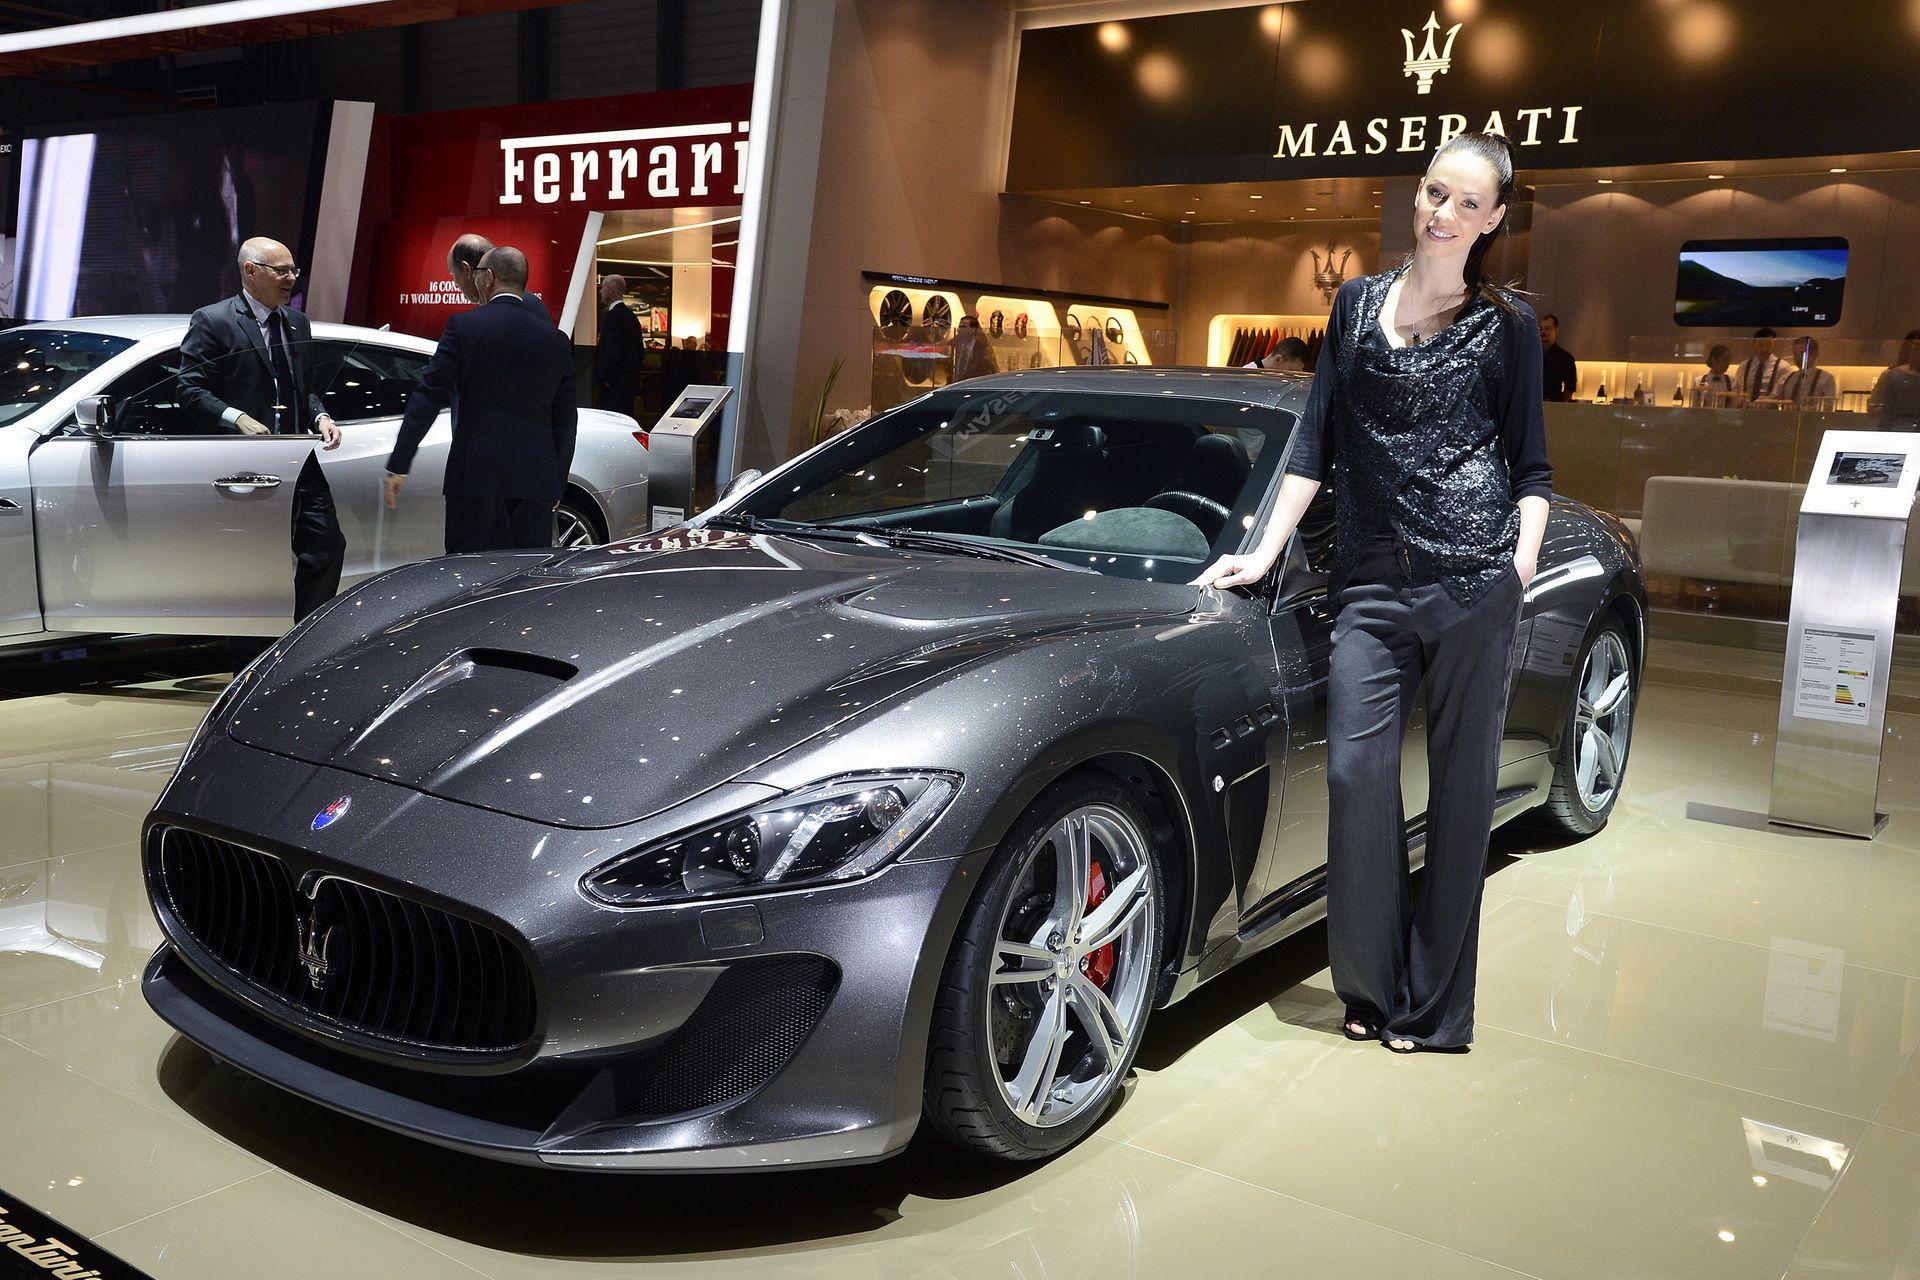 Maserati GranTurismo MC Stradale 3D Wallpaper | Maserati | Pinterest ...